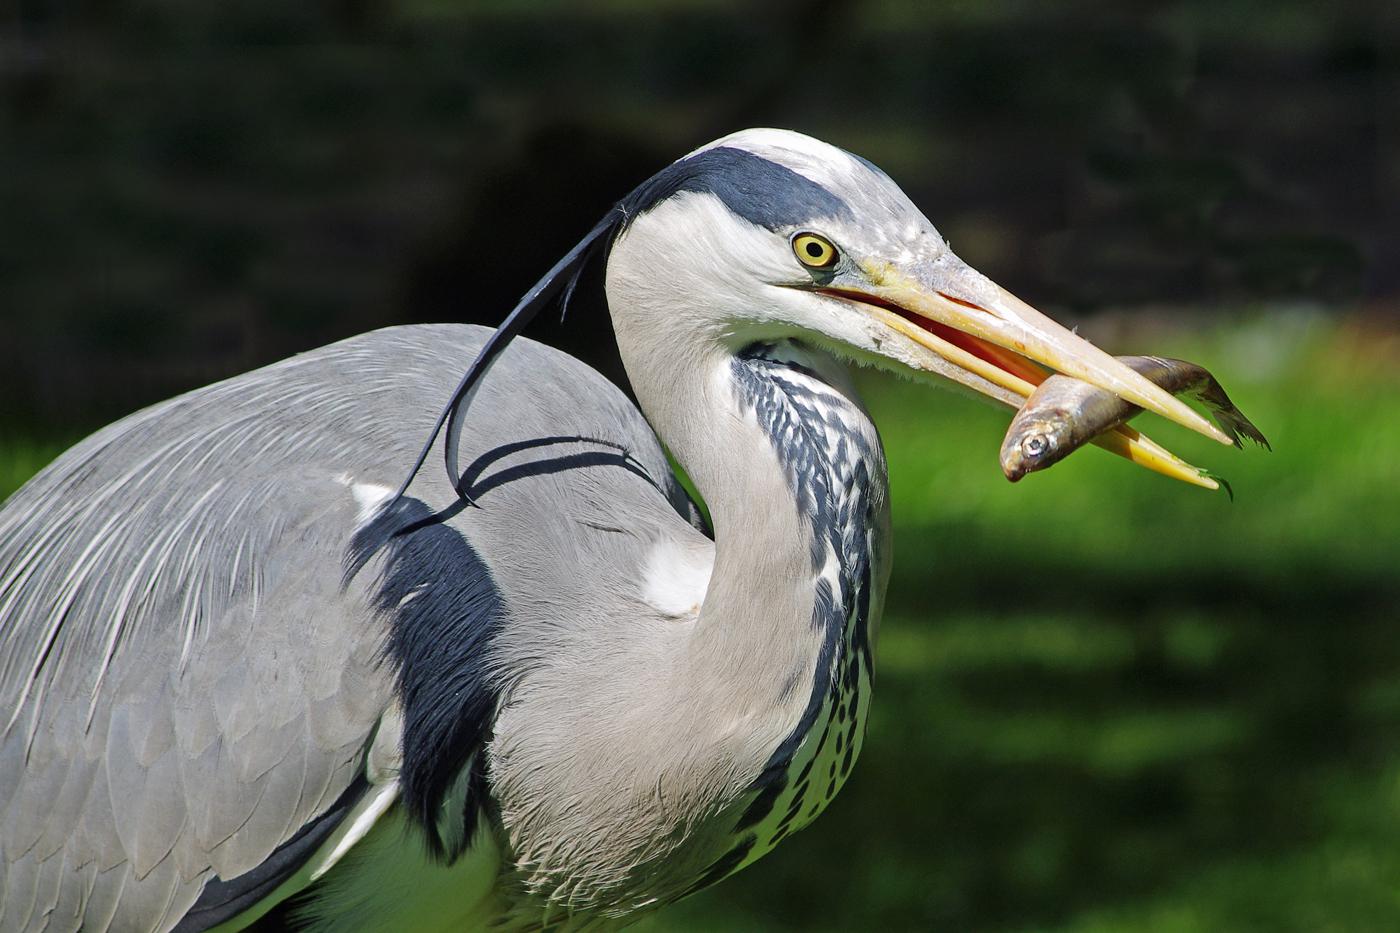 'Heron Feeding' by Richard Ramsey